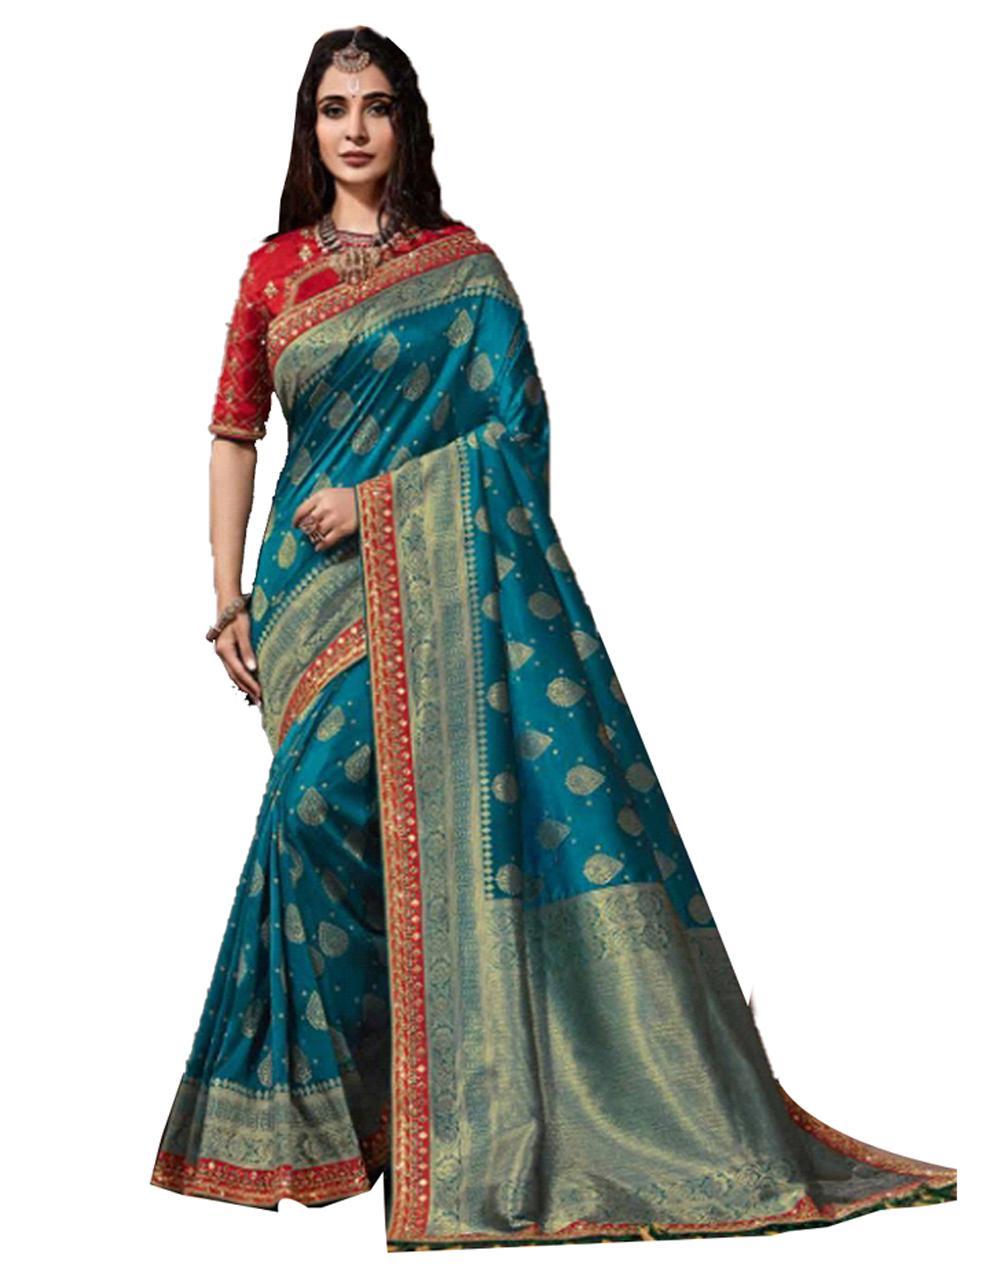 Morpeach Silk Saree With Blouse SD23888